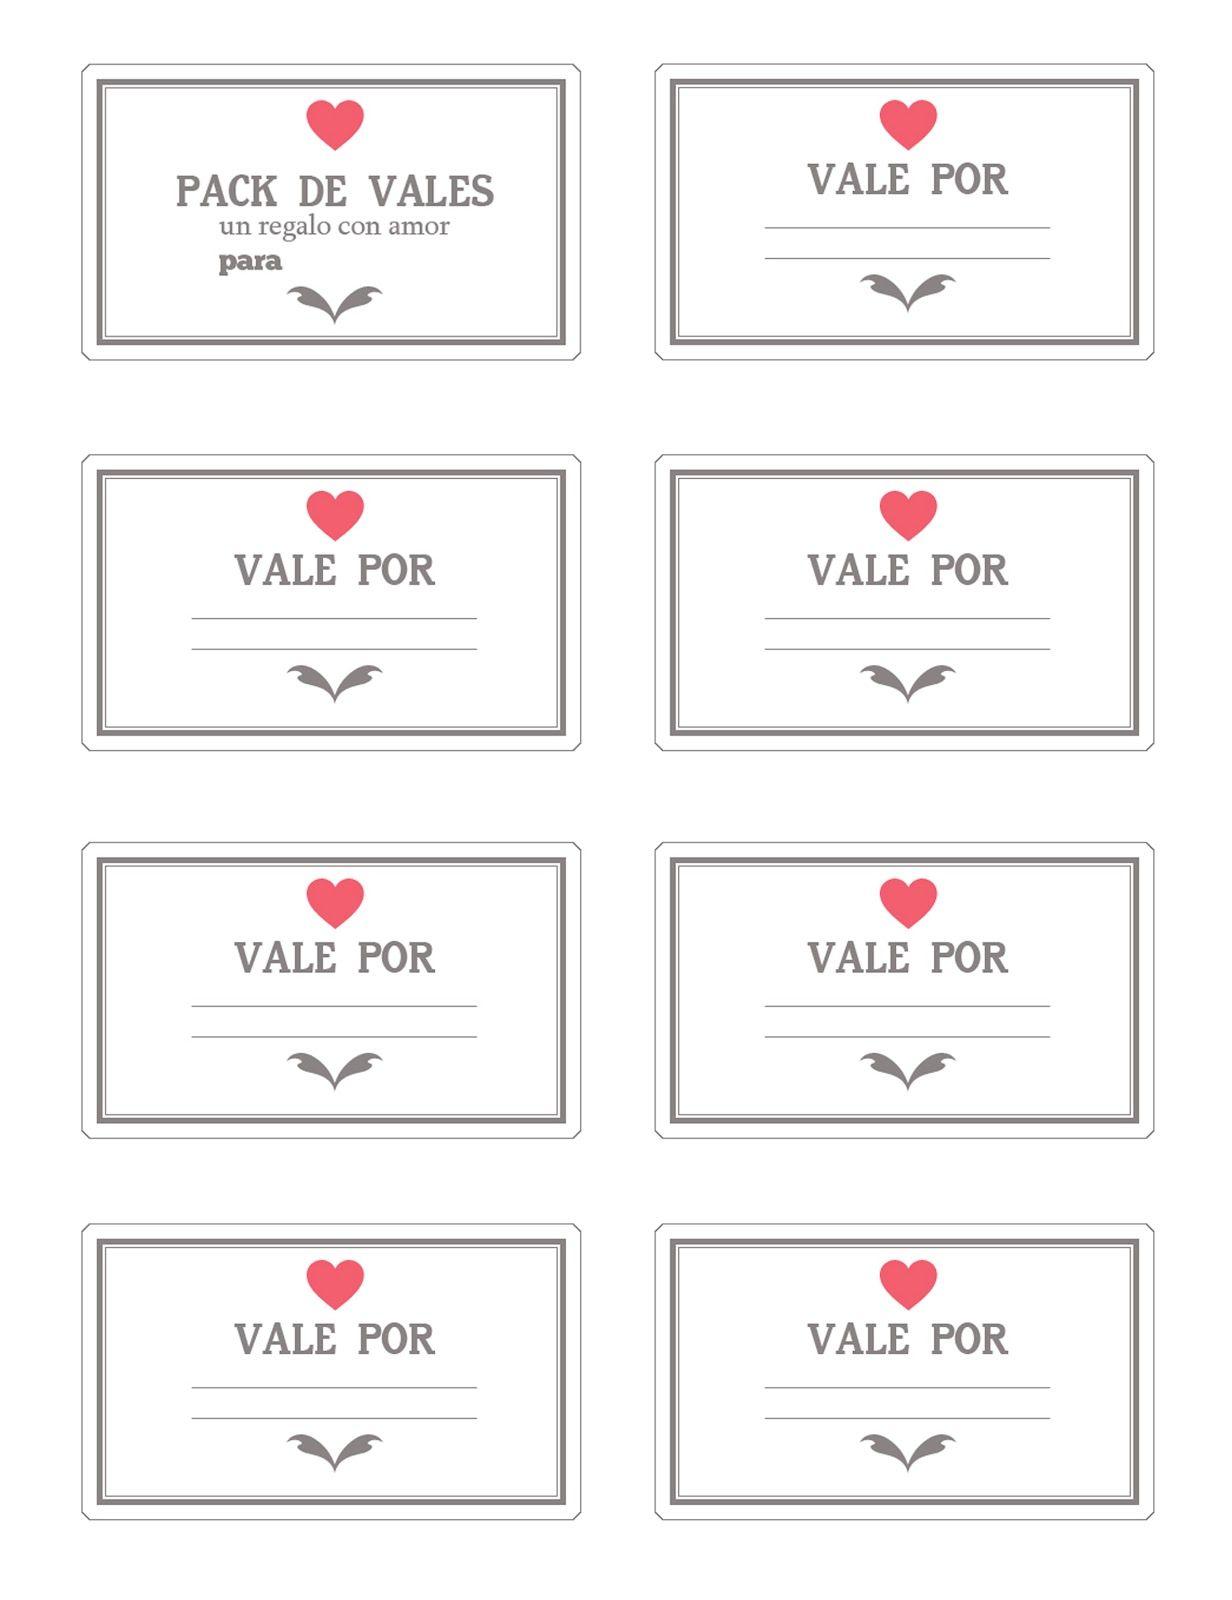 Vales imprimibles para san valentin